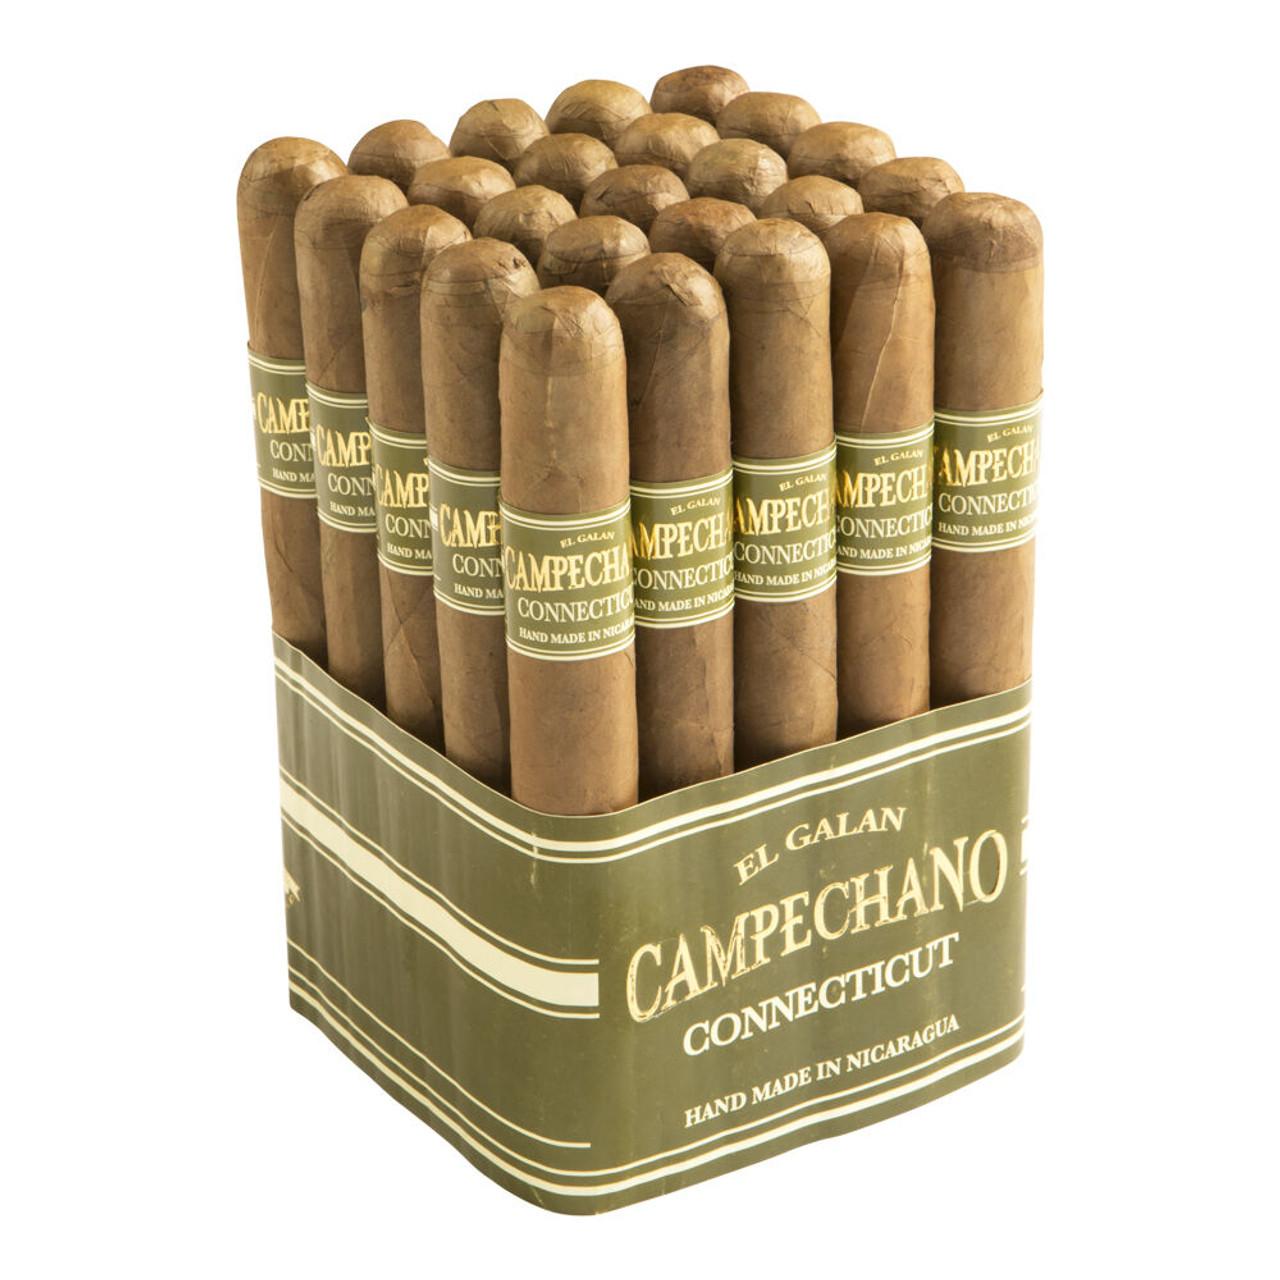 El Galan Campechano Churchill Cigars - 7 x 50 (Bundle of 25)